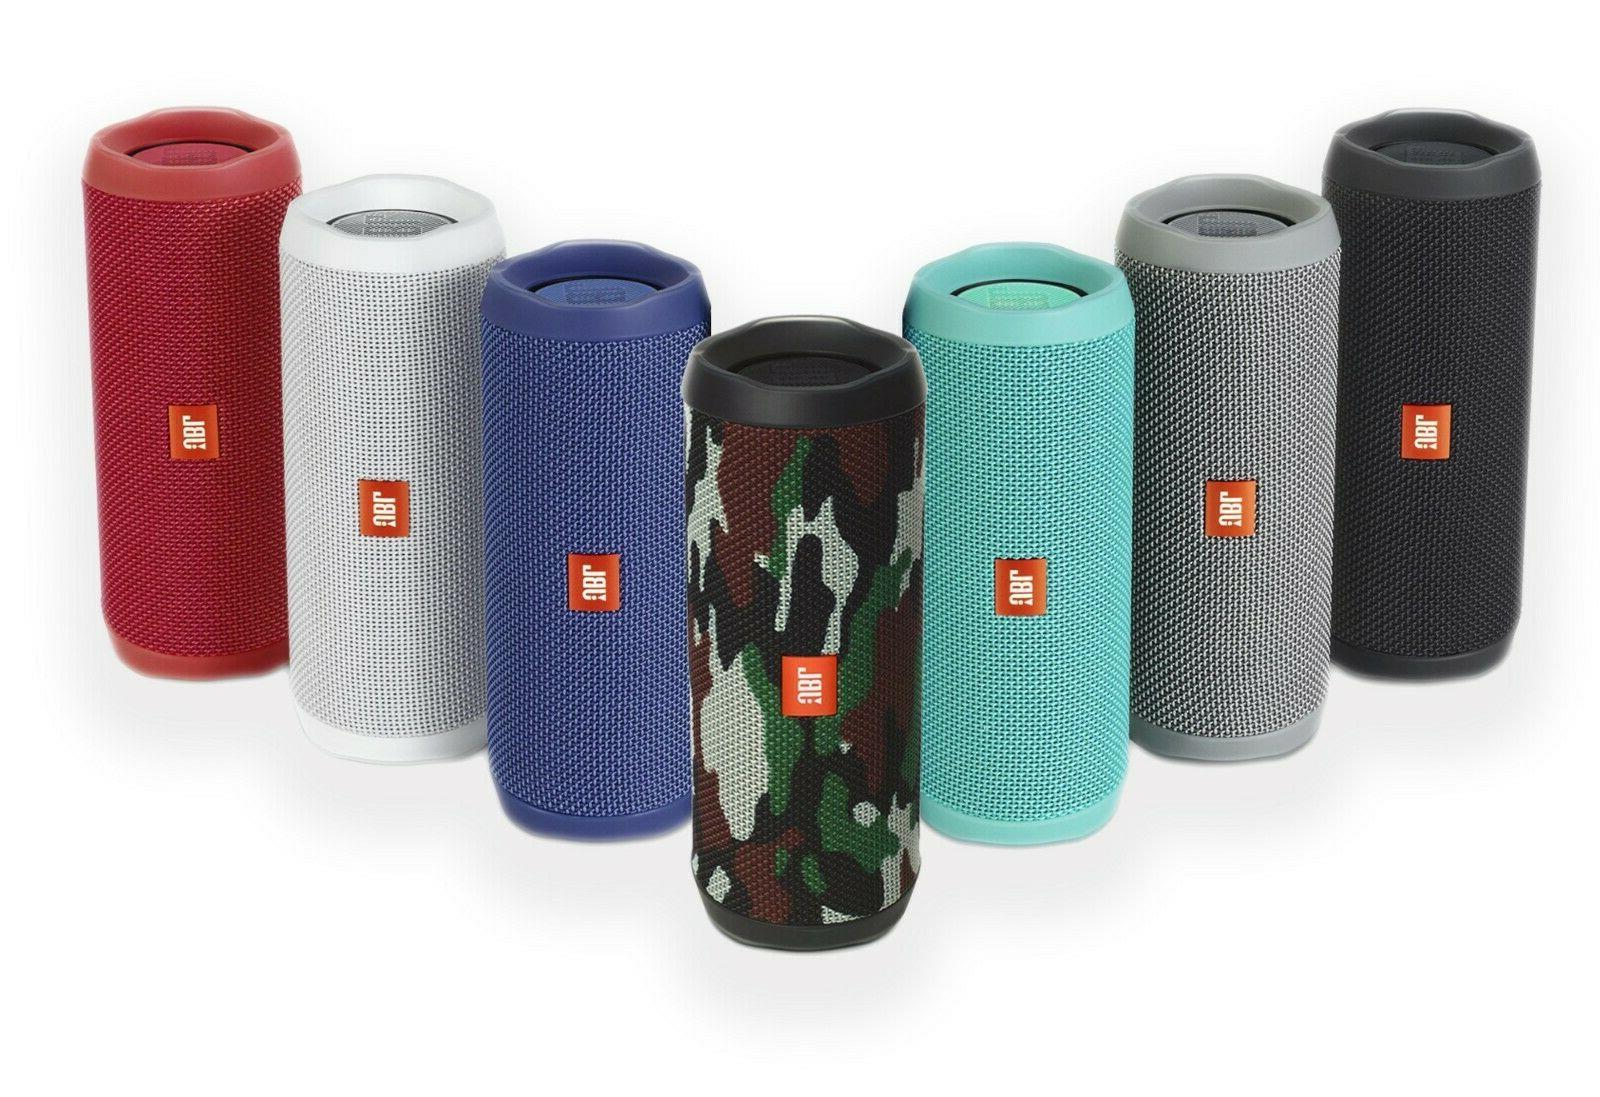 JBL Waterproof Portable Rechargeable Bluetooth Speaker